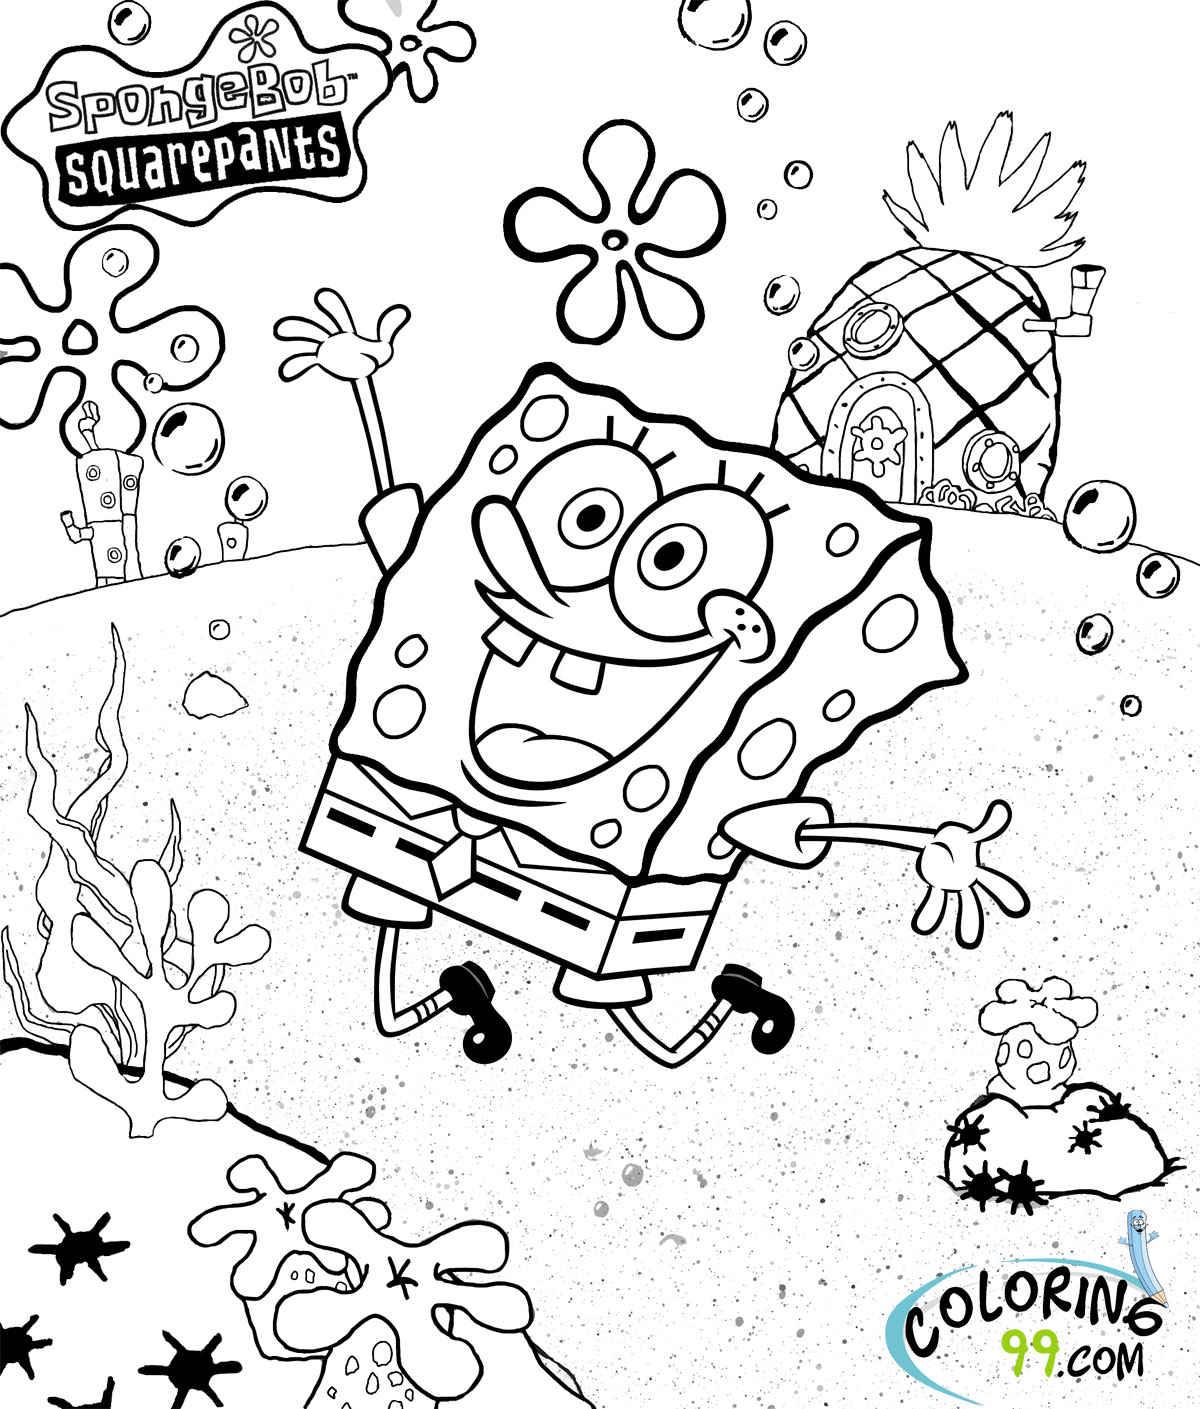 Spongebob Squarepants Coloring Pages Free Printable